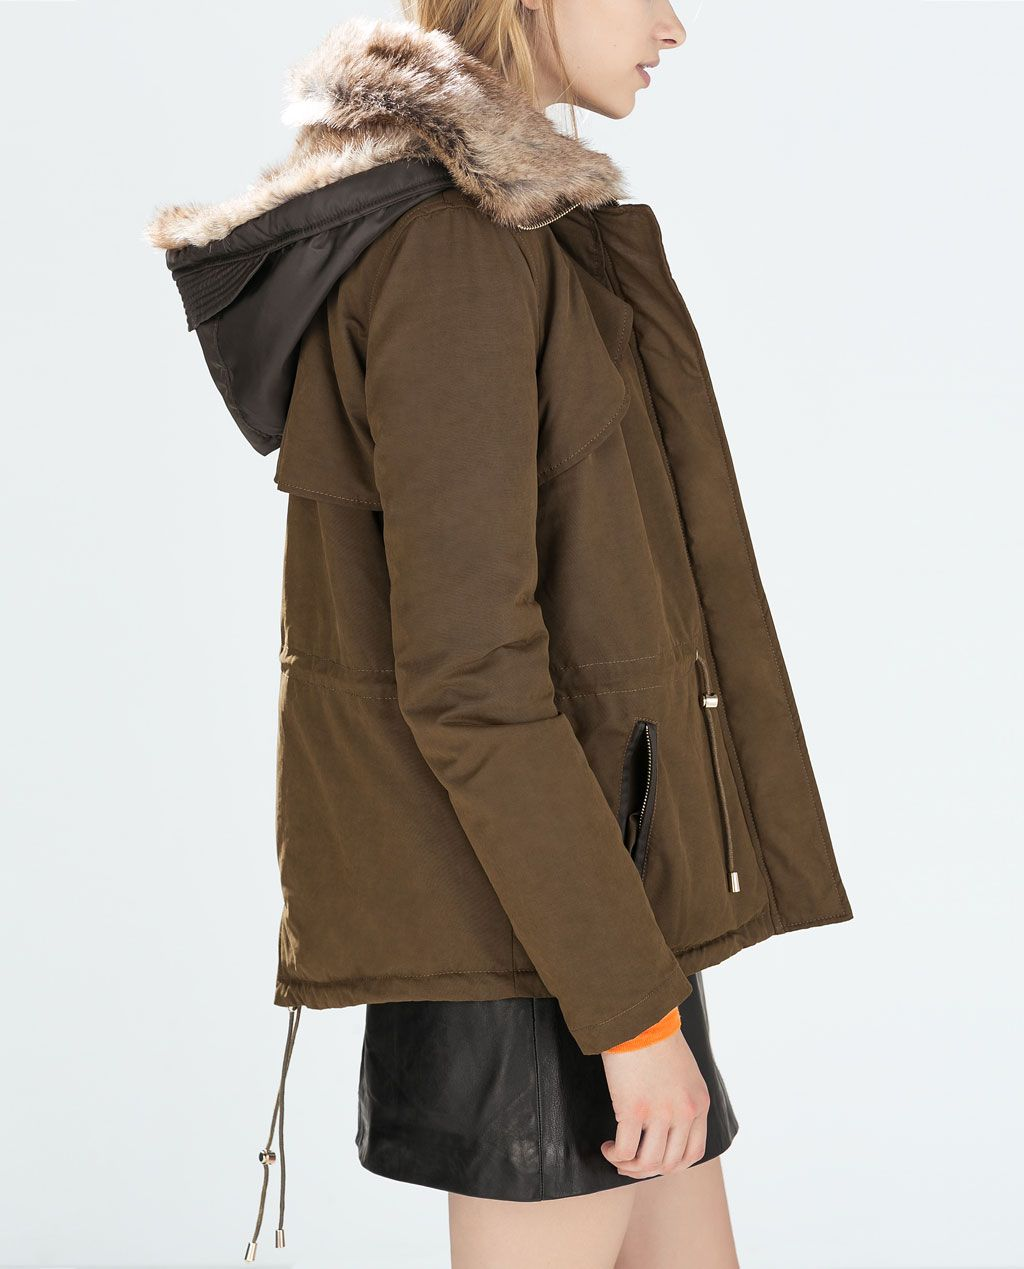 Mujeres Shopping Zara Zara Trf Parka Contraste Pinterest qqYO7n